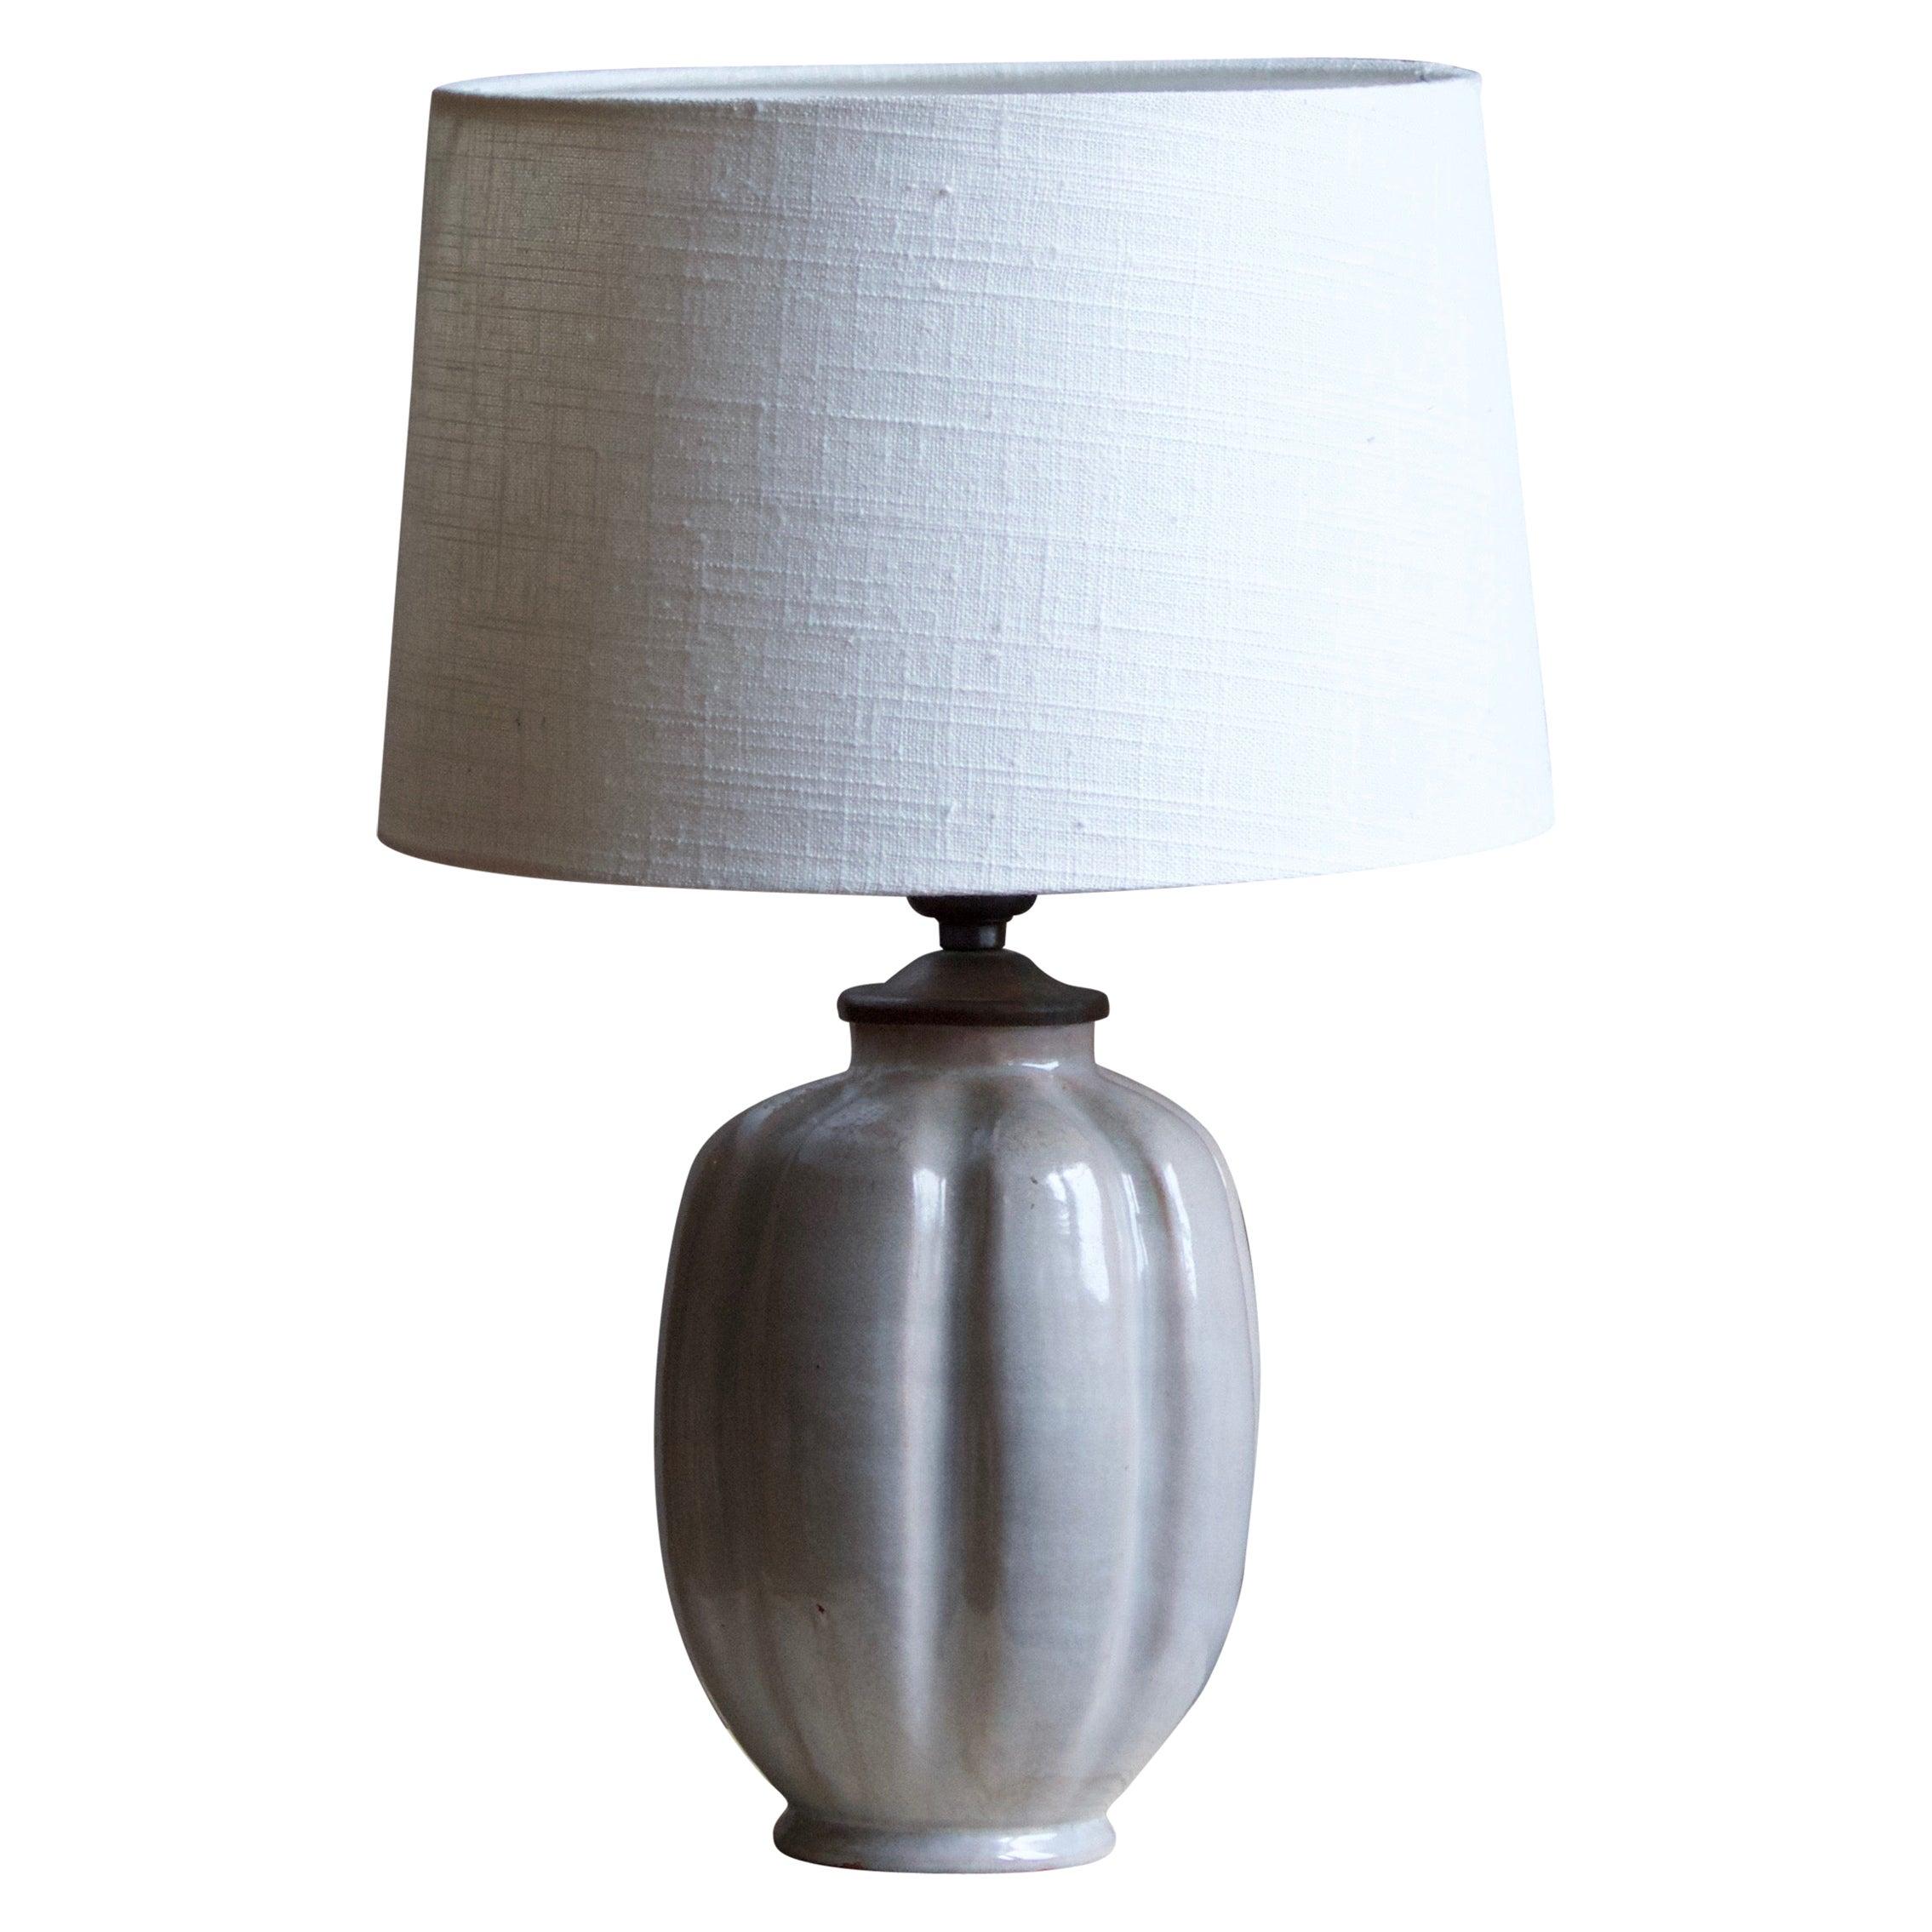 Nittsjö, Fluted Table Lamp, Grey Glazed Ceramic, Brass, Sweden, 1940s